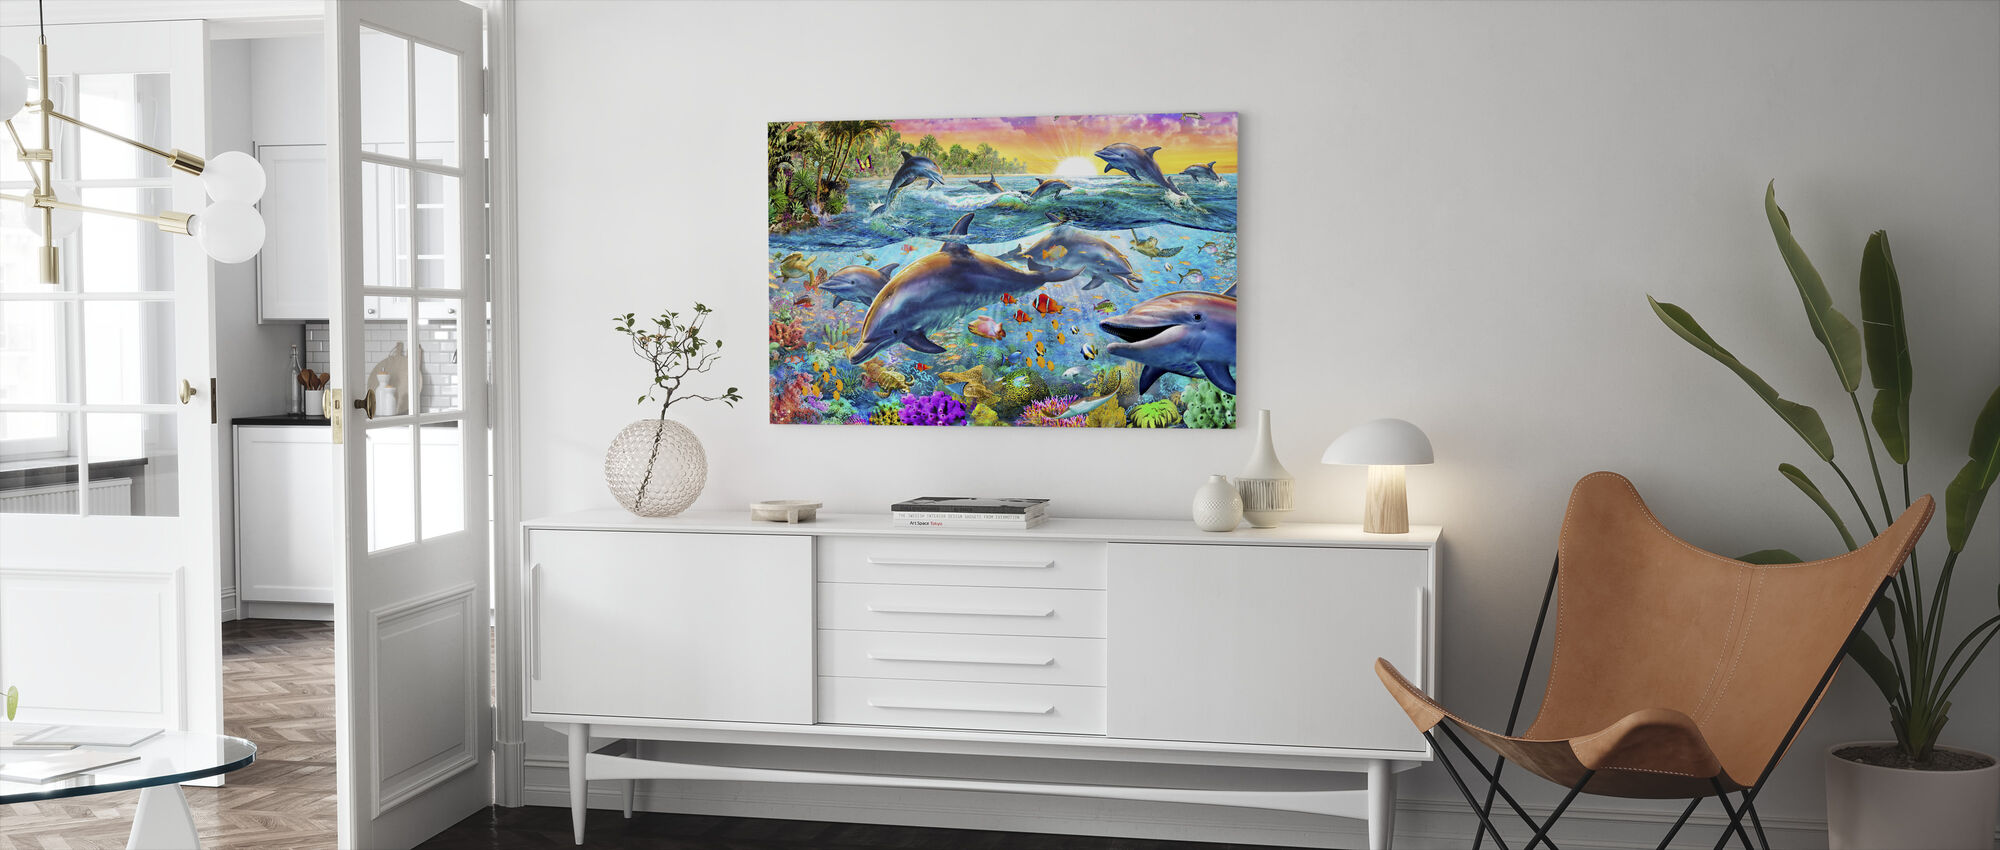 Tropische dolfijnen - Canvas print - Woonkamer